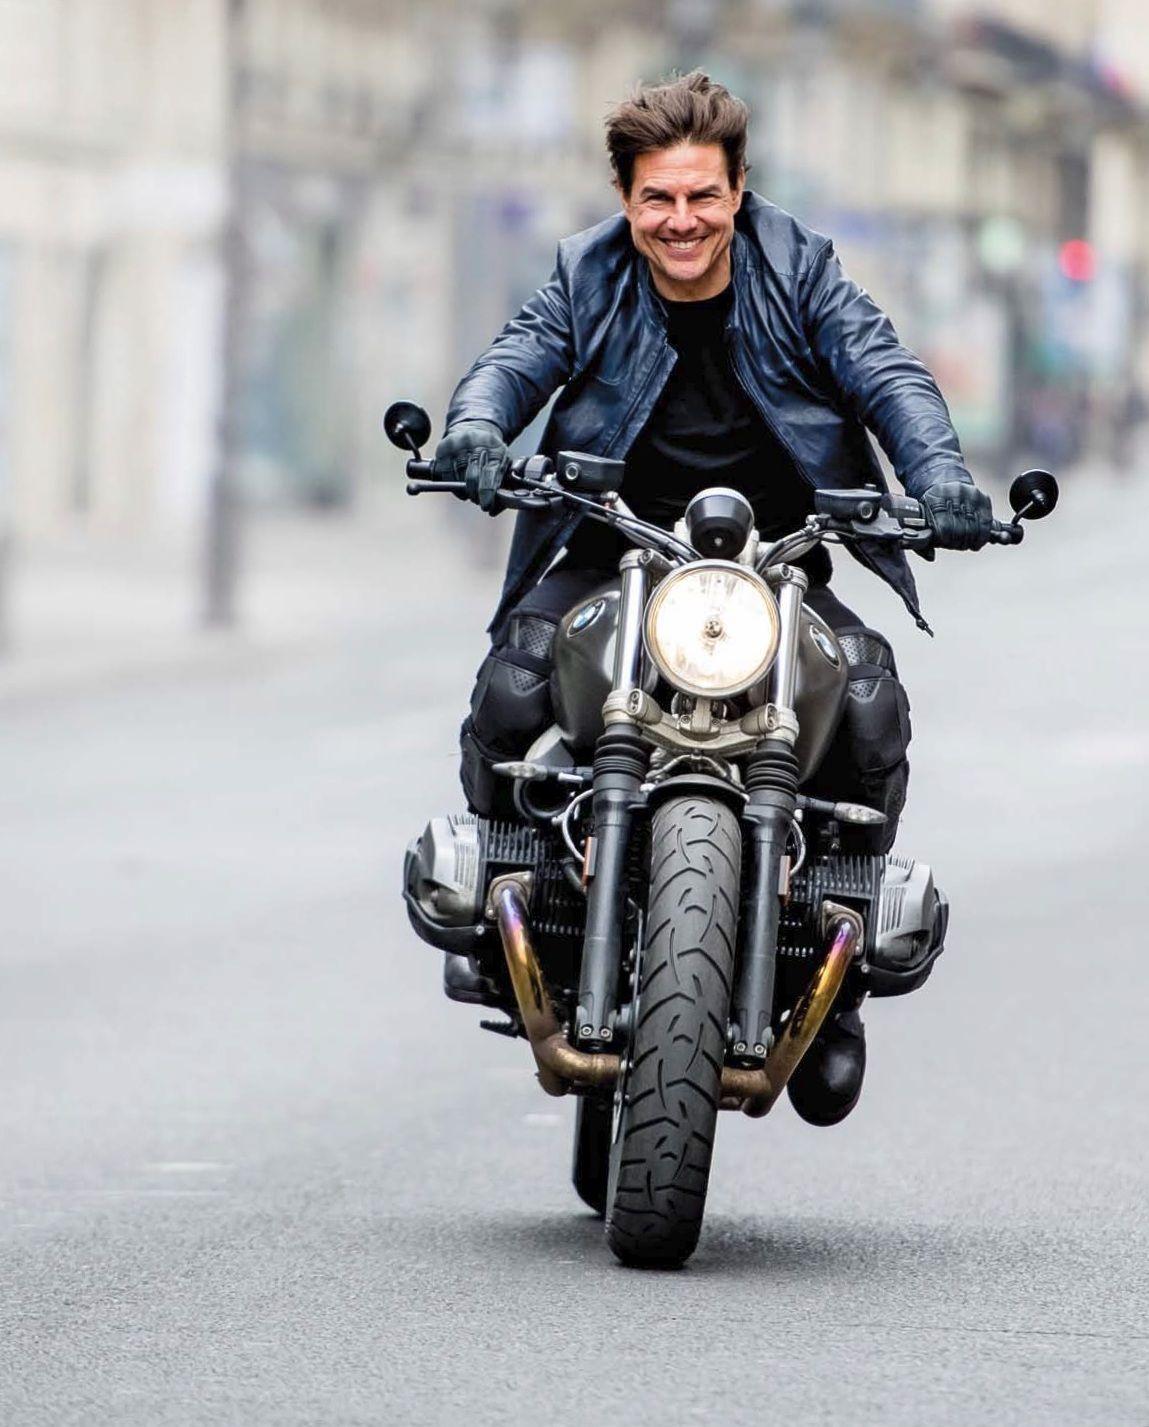 Tom Cruise Sur Une Bmw R Nine T Scrambler Paris 2017 Tom Cruise